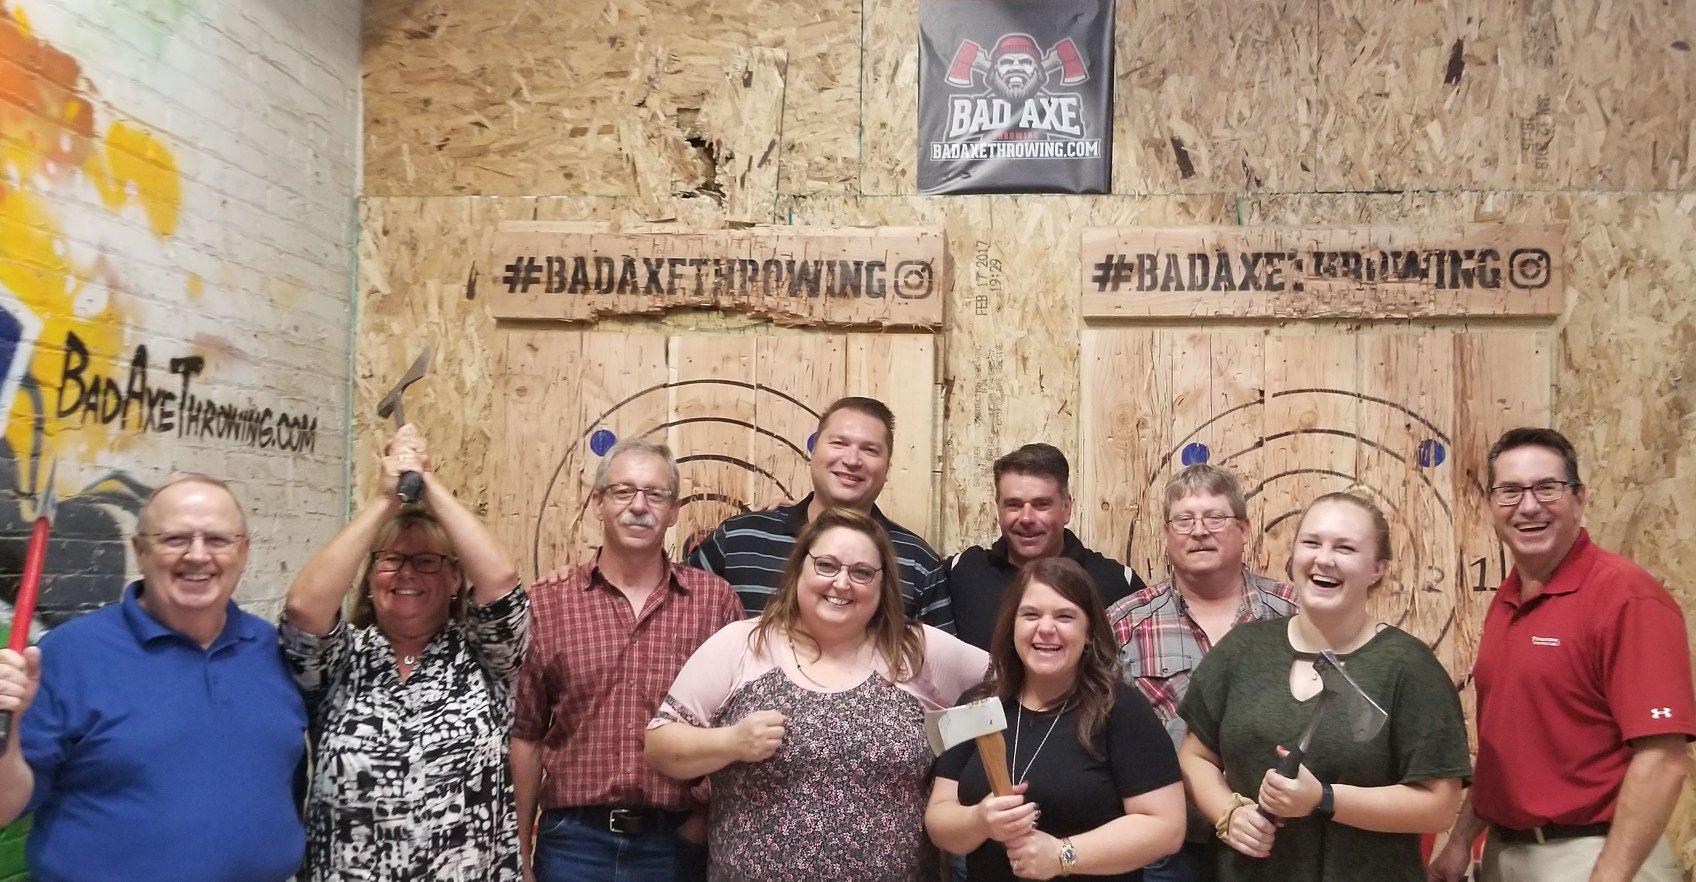 bad axe throwing 8